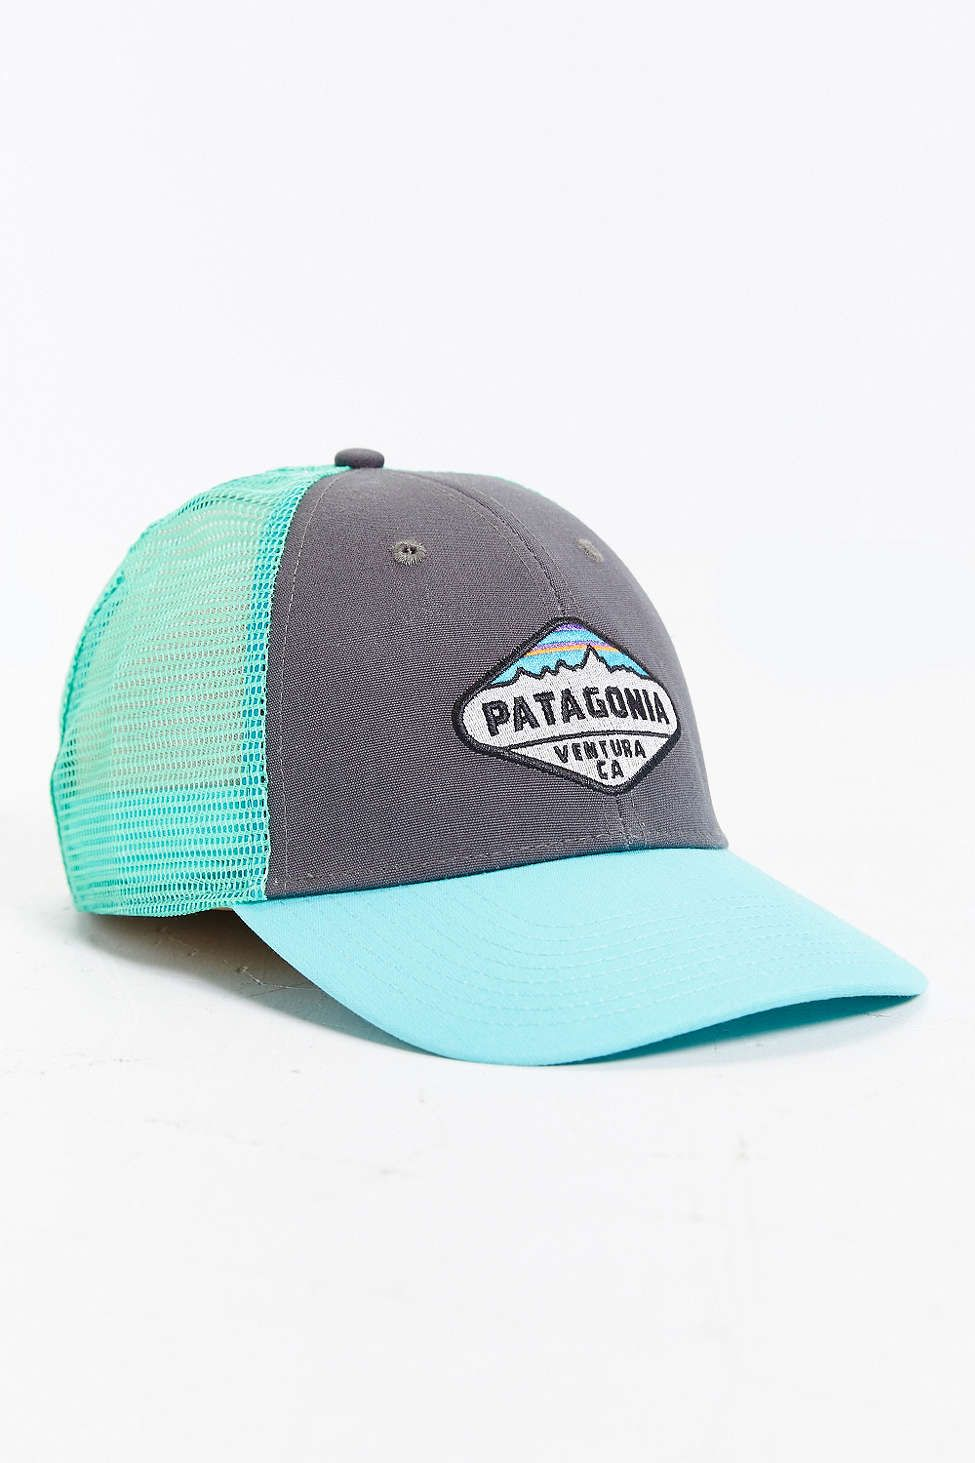 Patagonia Fitz Roy Crest LoPro Trucker Hat  3c85e846cc6